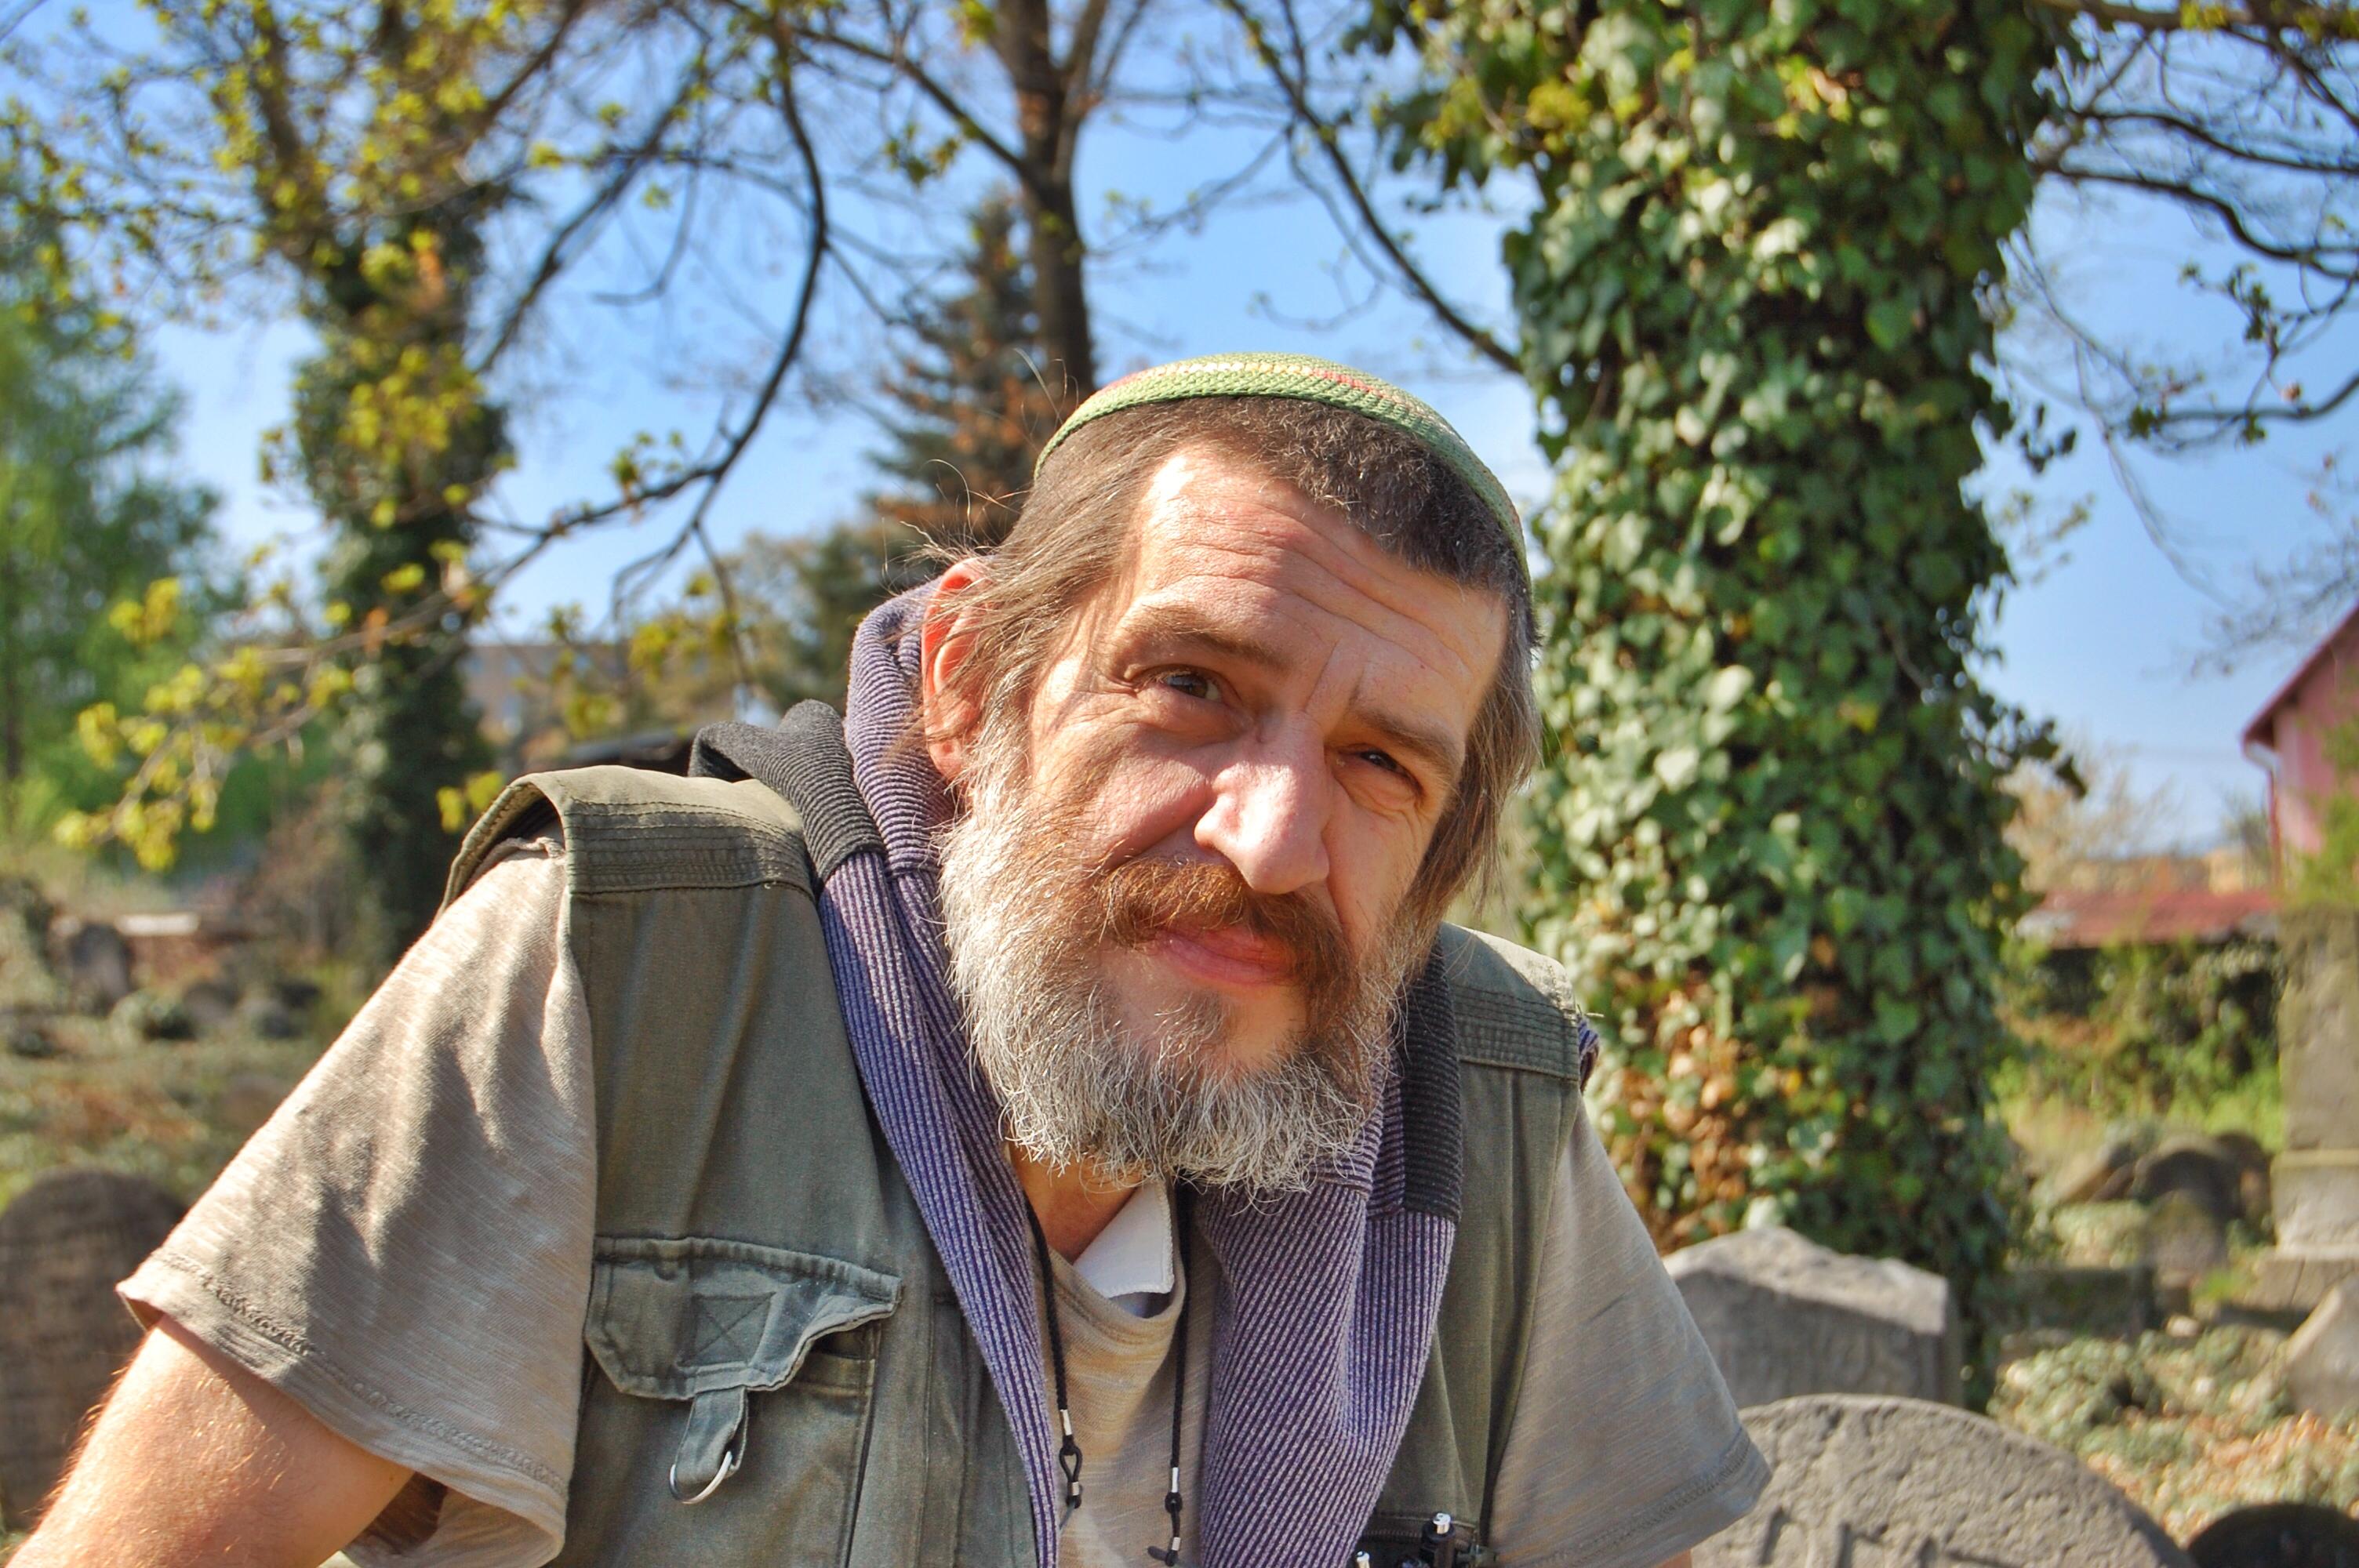 Image of Jaroslav Achab Haidler from Wikidata